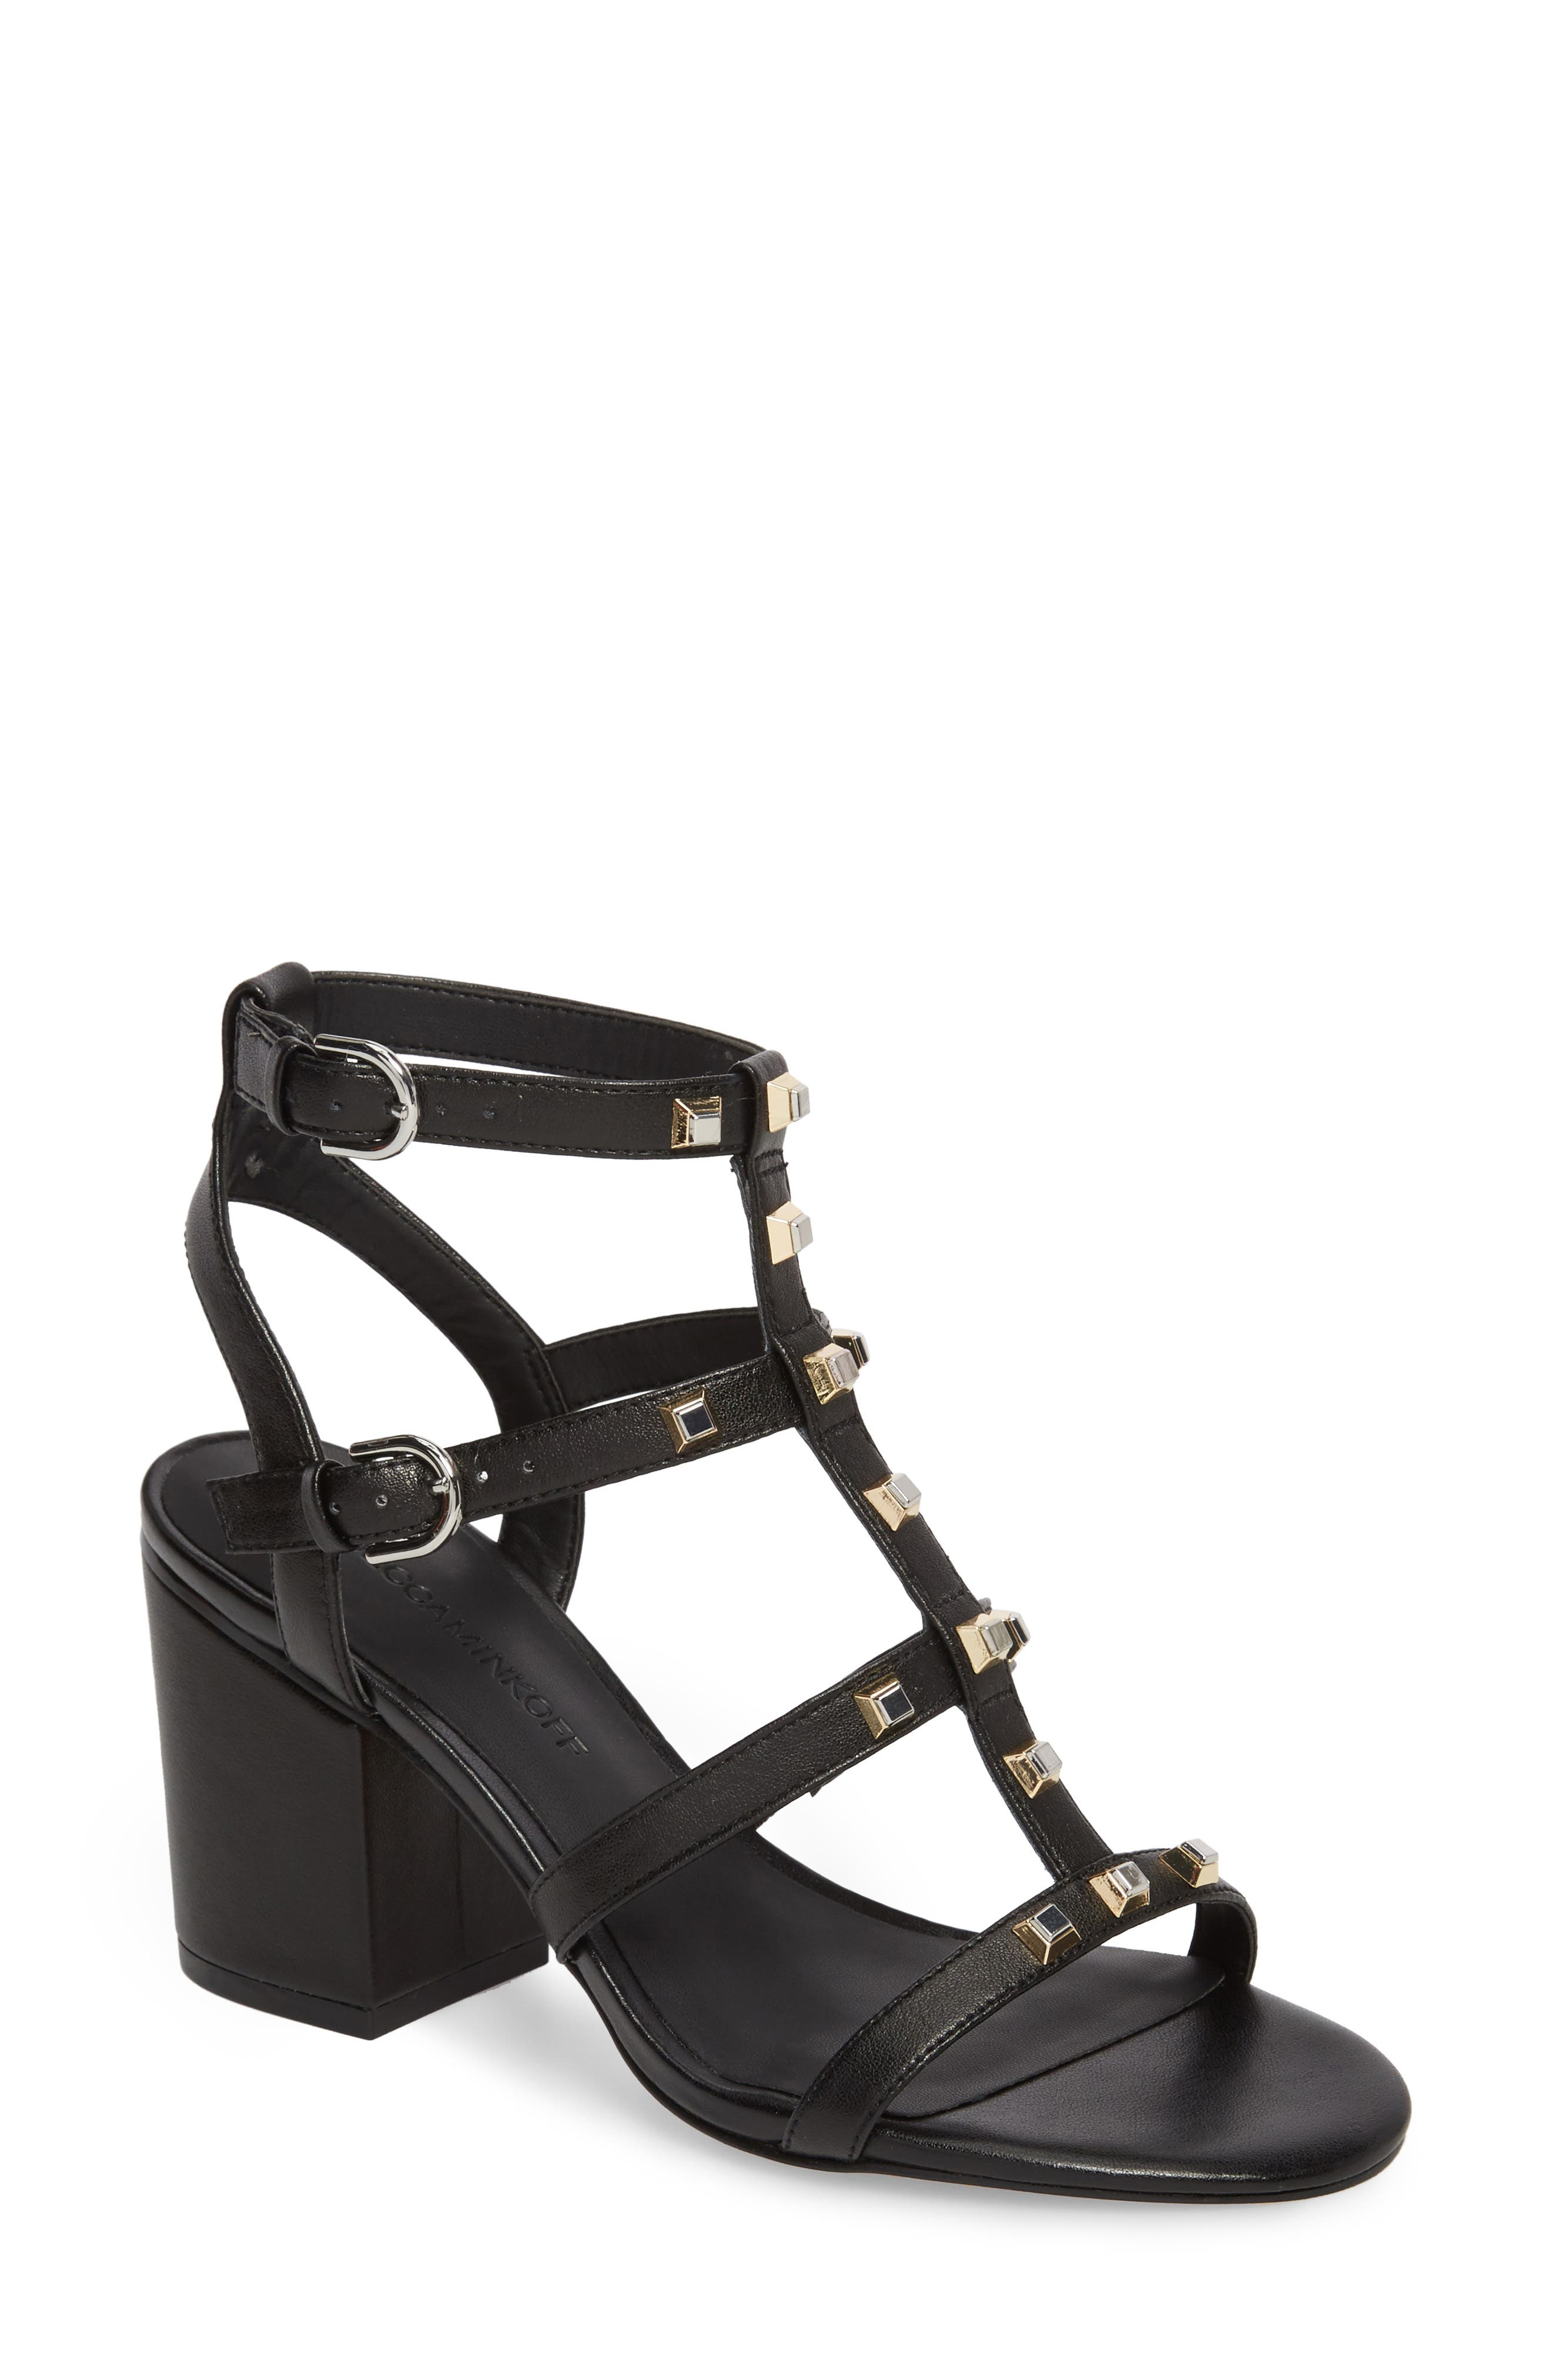 Lenore Sandal,                         Main,                         color, 001